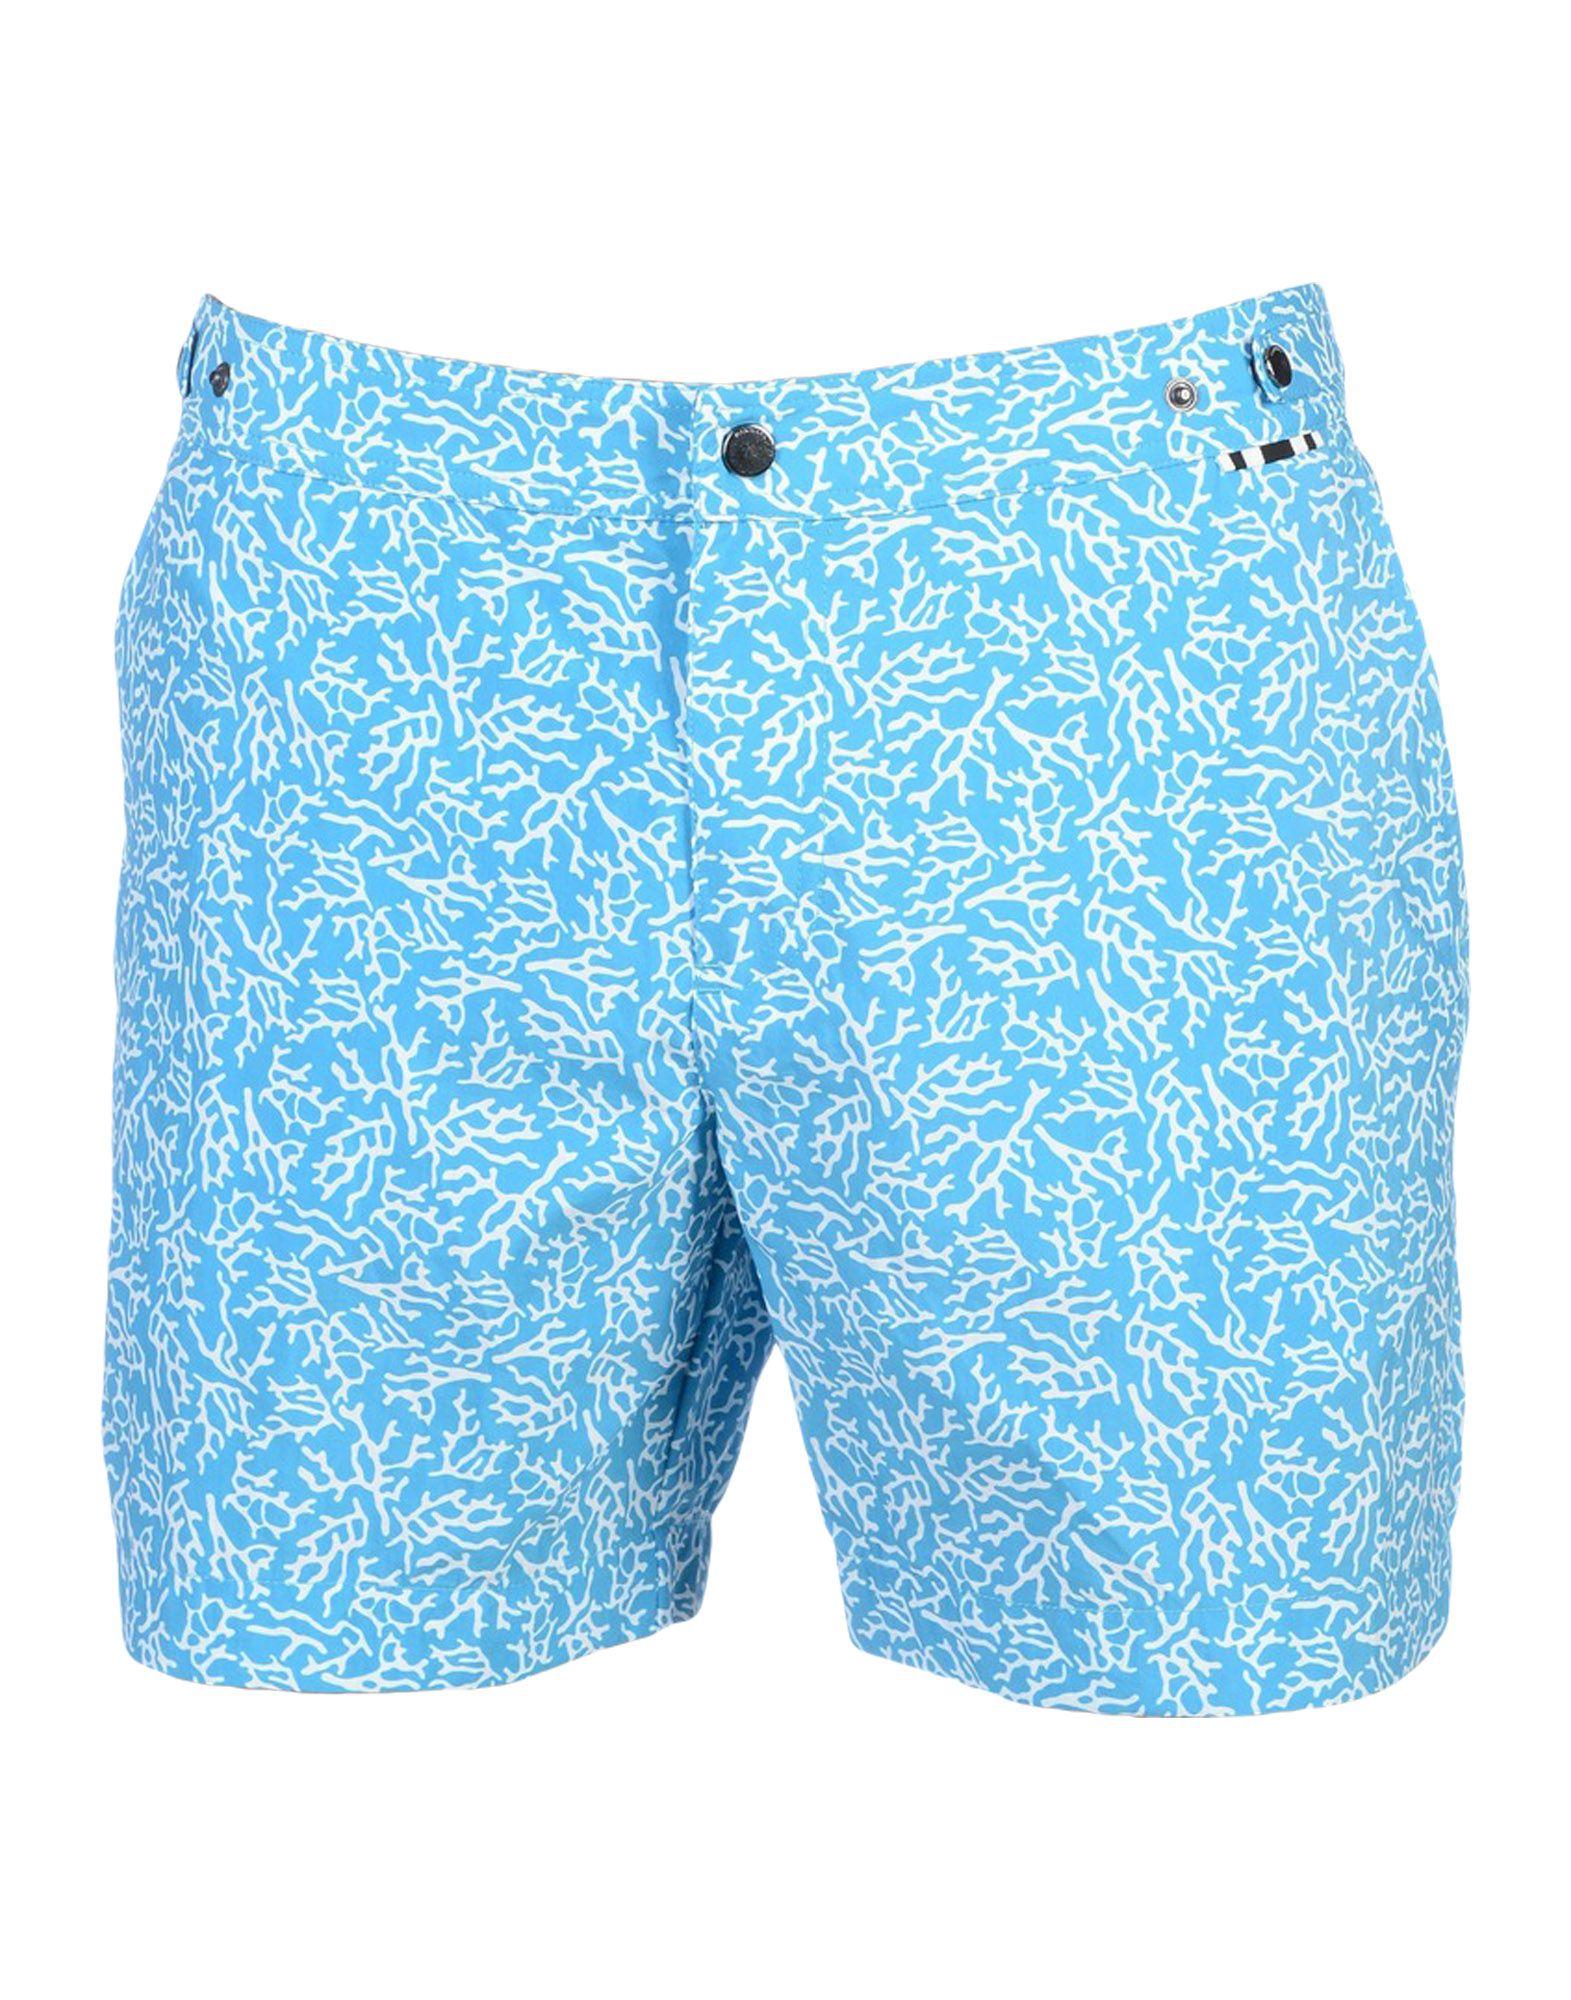 DAN WARD Swim Trunks in Turquoise